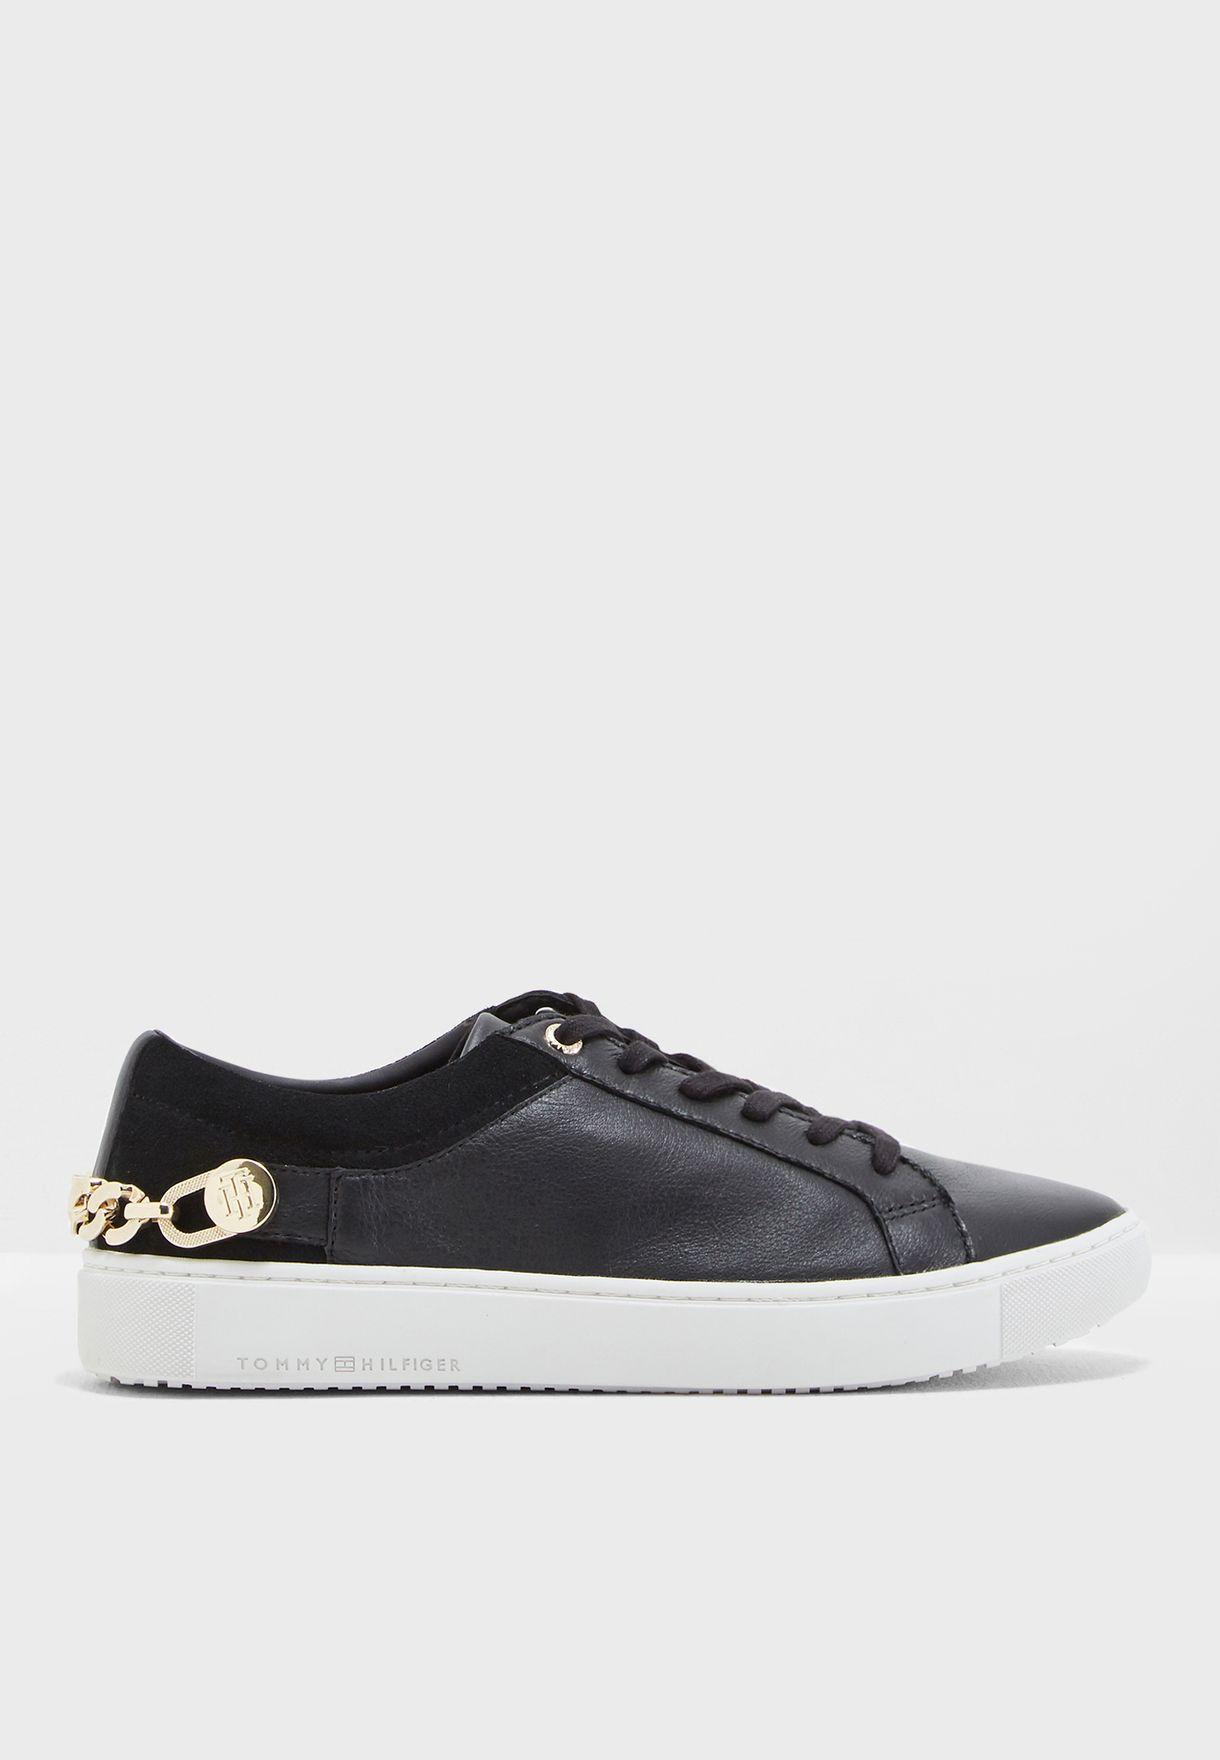 1b5d4f9b3 Shop Tommy Hilfiger black Tommy Chain Flag Sneaker FW0FW03265 for ...